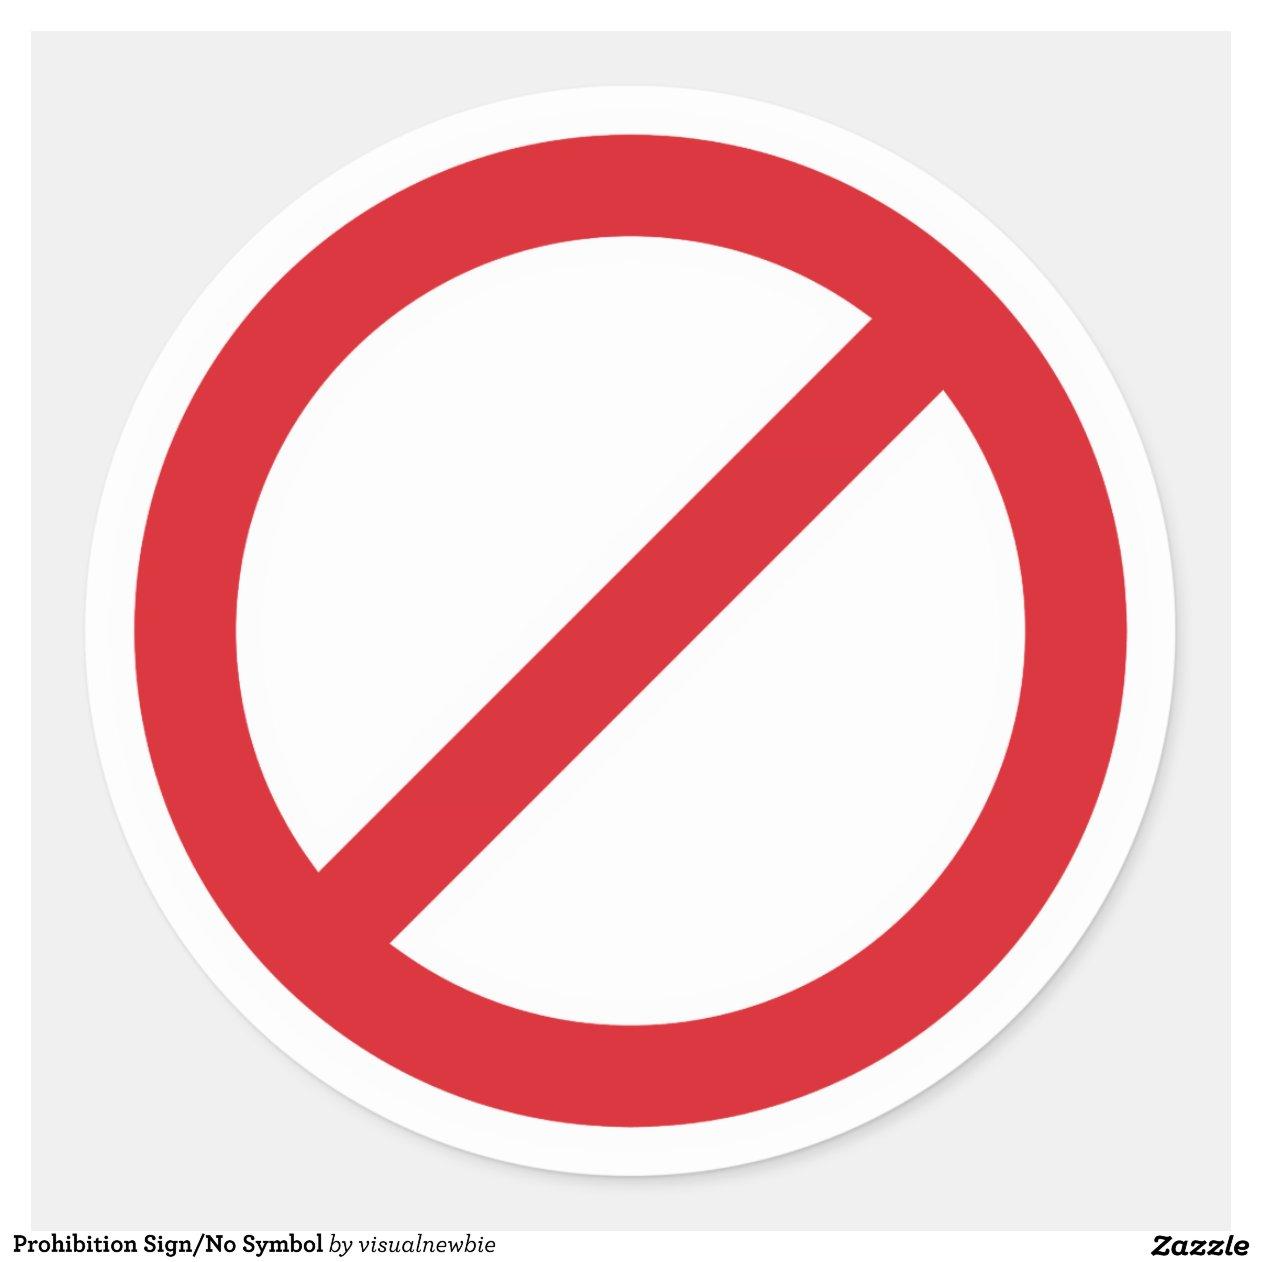 symbole de linterdiction sign no sticker rond rd274fd9413404b6985f88e181bce409d v9waf 8byvr 1200. Black Bedroom Furniture Sets. Home Design Ideas